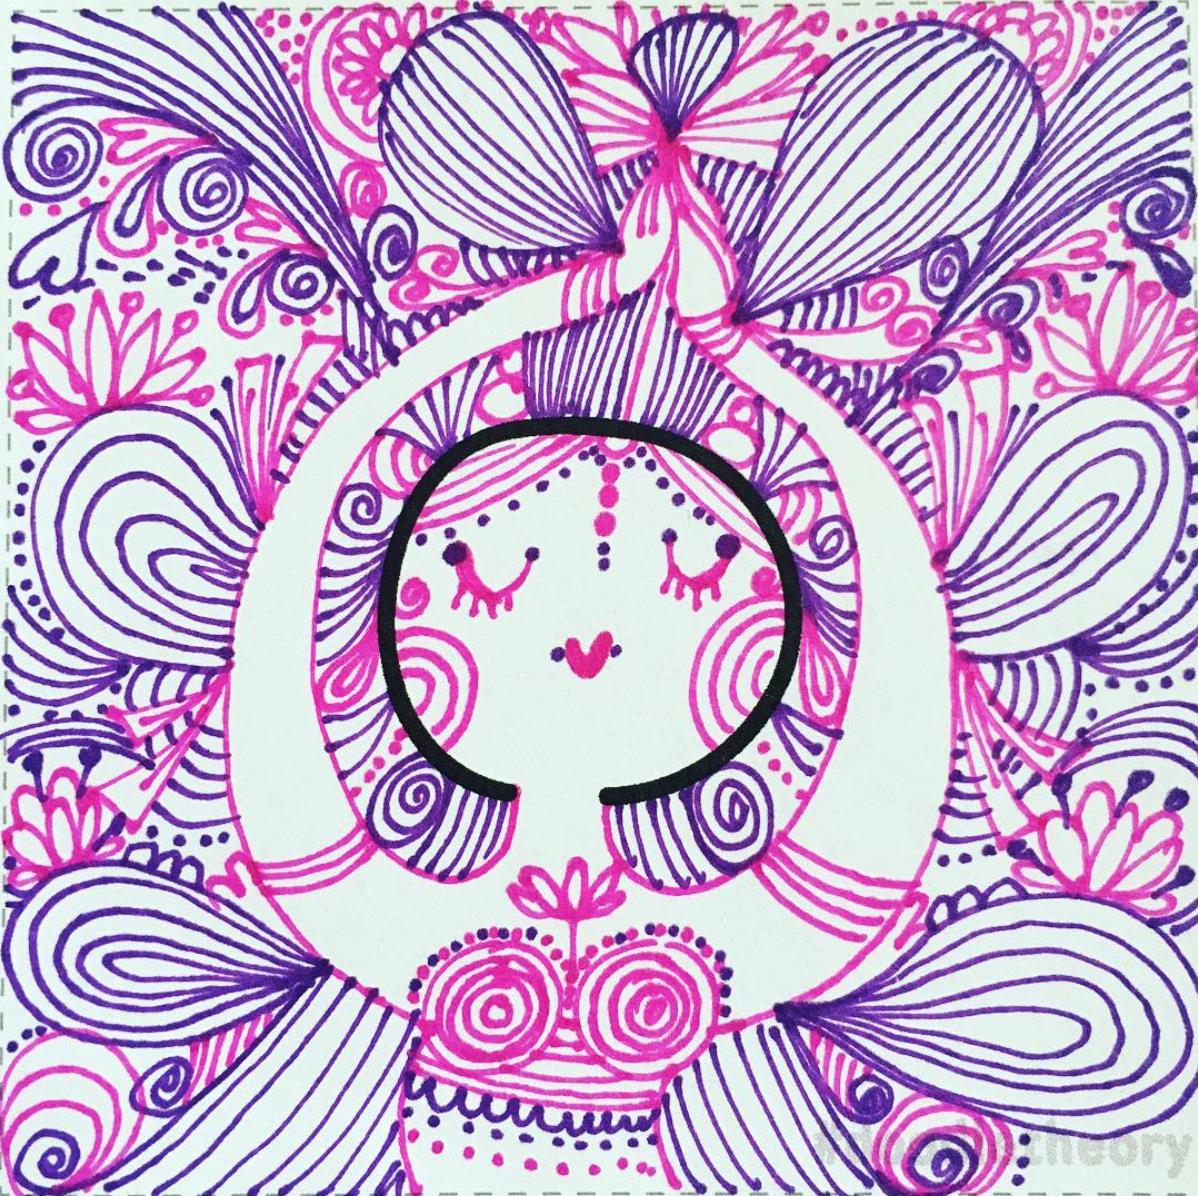 Drawn by Nivea Ortiz from San Juan, Puerto Rico. Instagram:  @nivea_ortiz